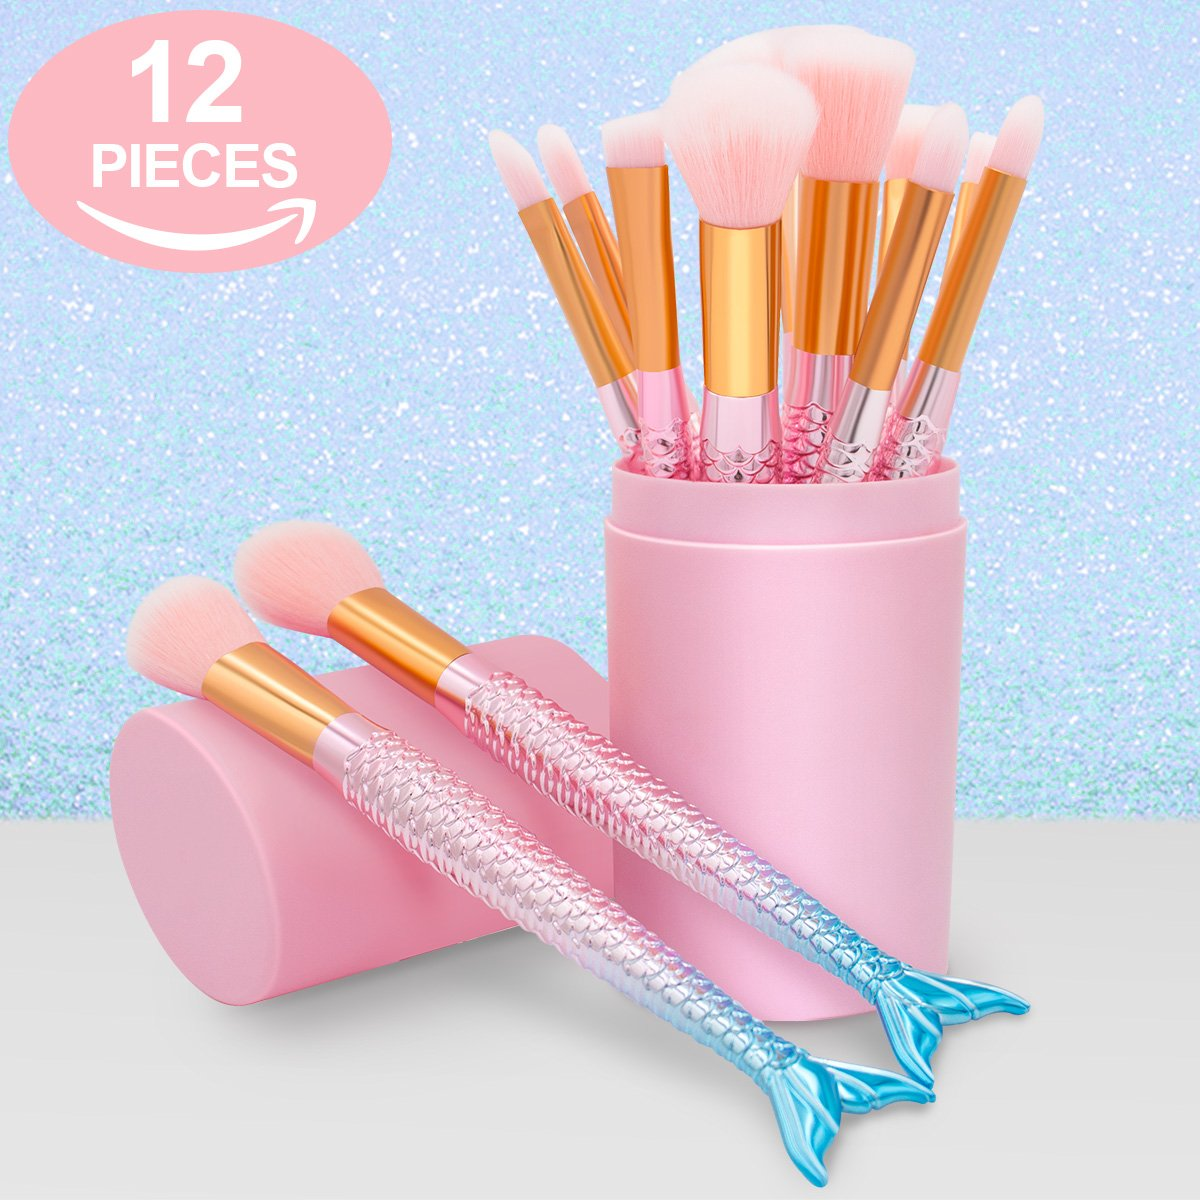 Makeup Brushes Set- Cosmetic Conceler Brushes Kit Tool 12PCS Make Up Foundation Eyebrow Eyeliner Blush Concealer Brushes Pink Mermaid Colorful